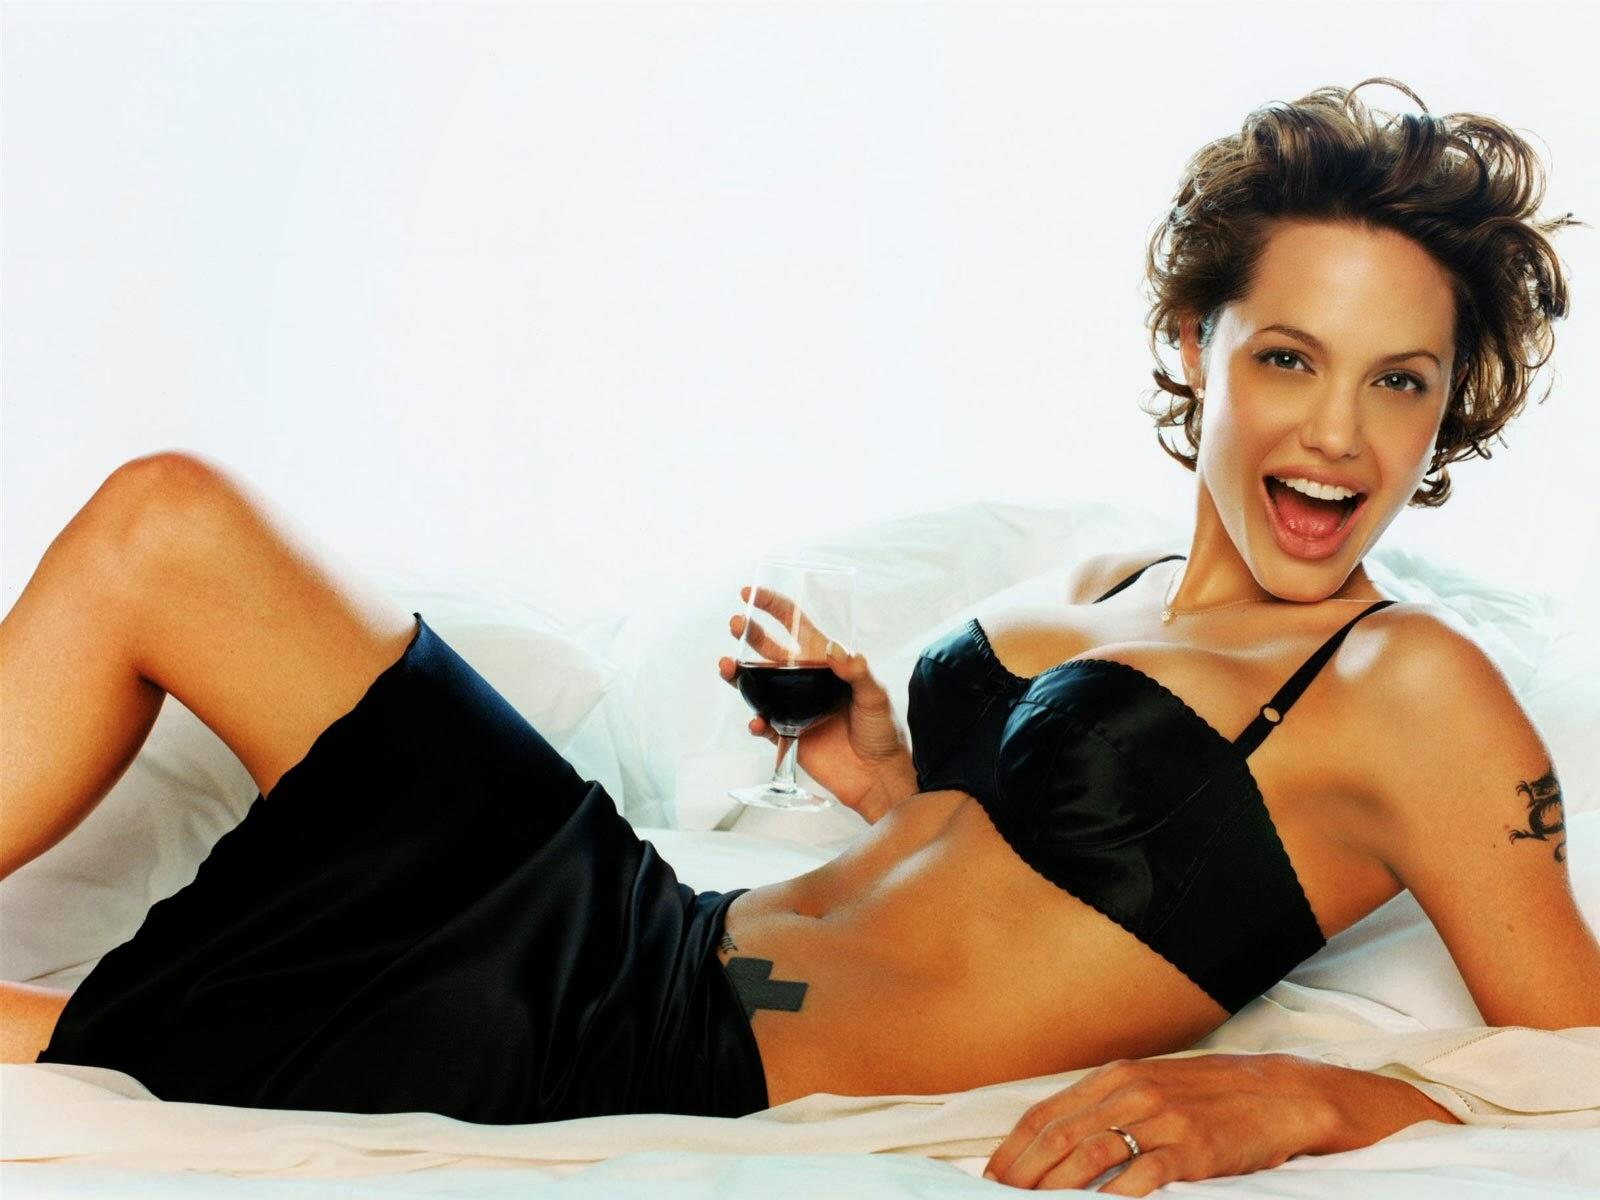 AtoZ hotphotos: Angelina-jolie hot stills